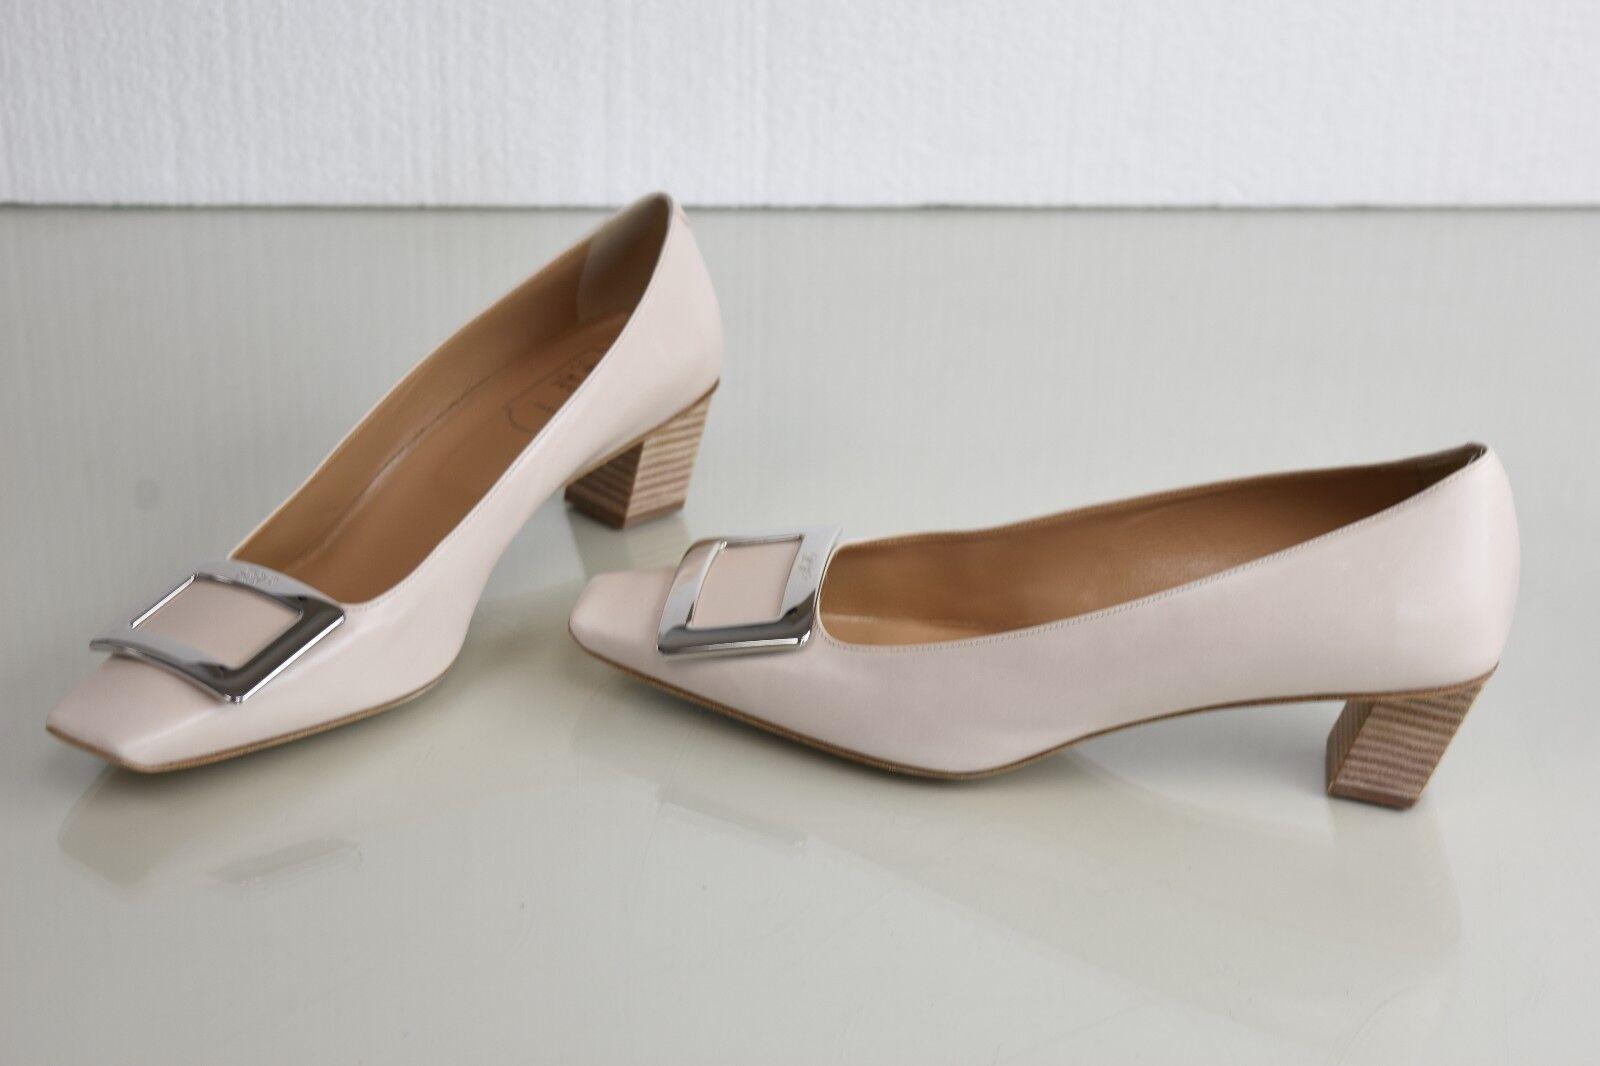 NEW Roger Vivier Belle Decollete Leather Pumps Buckle Nude Beige Heels Shoes 40